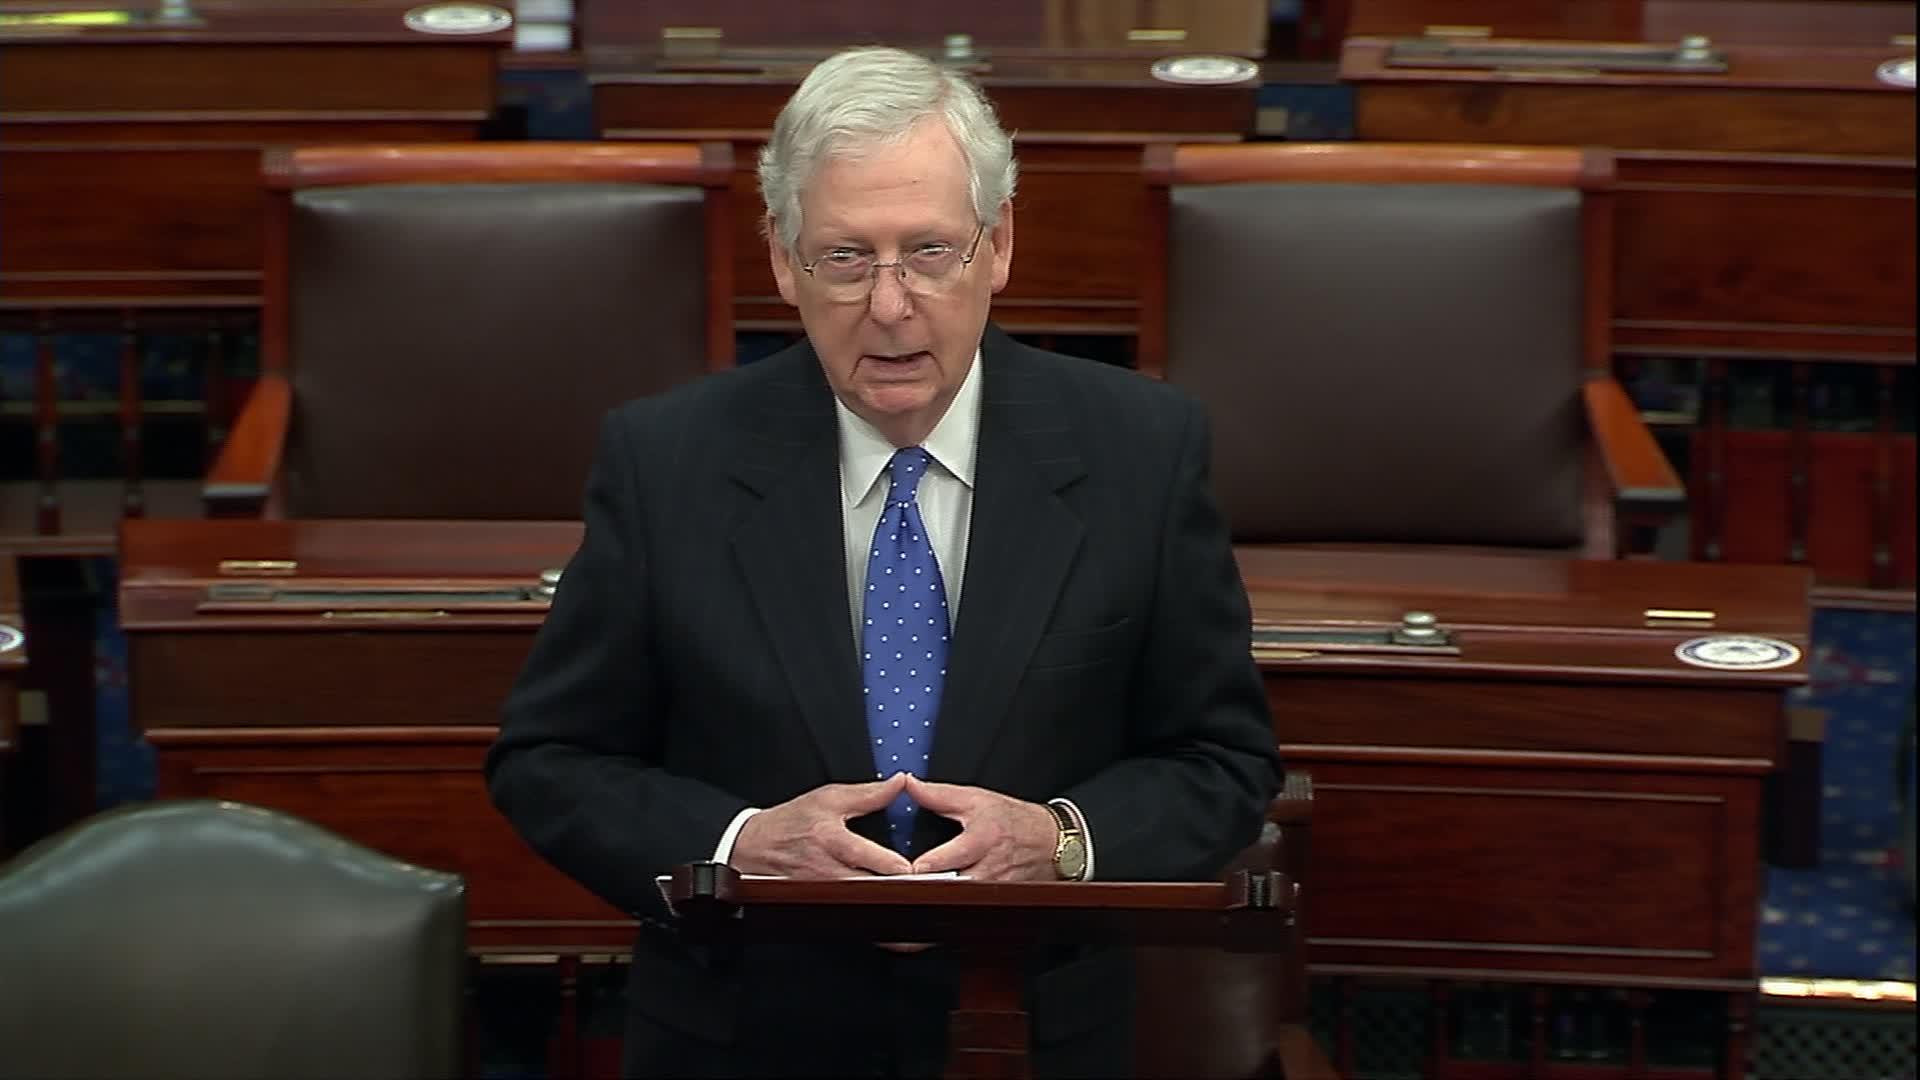 Senate Majority Leader Mitch McConnell speaks on the Senate floor on December 1.